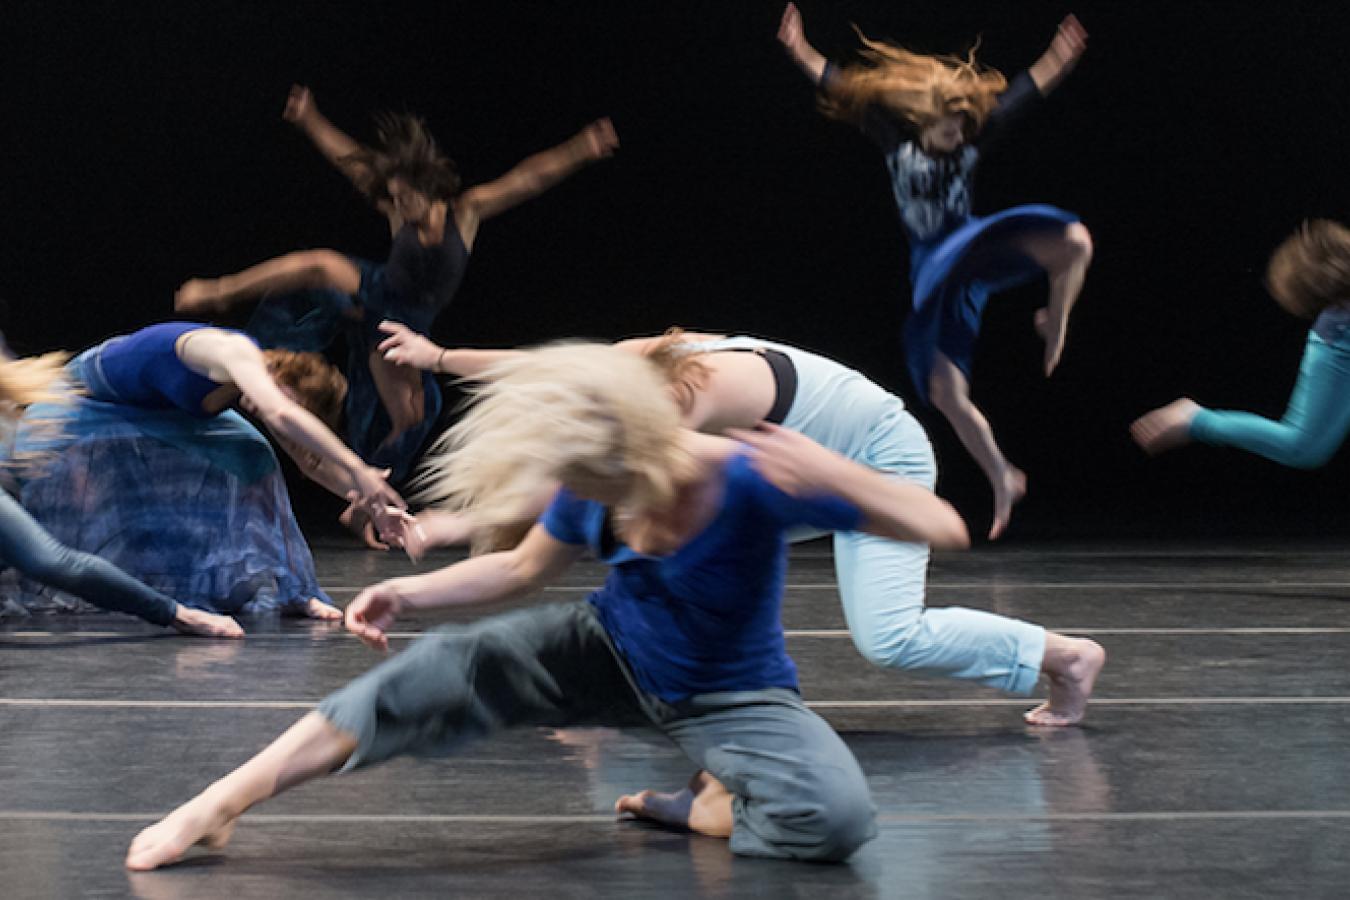 Live Art Dance Contemporary Dance Series in Halifax